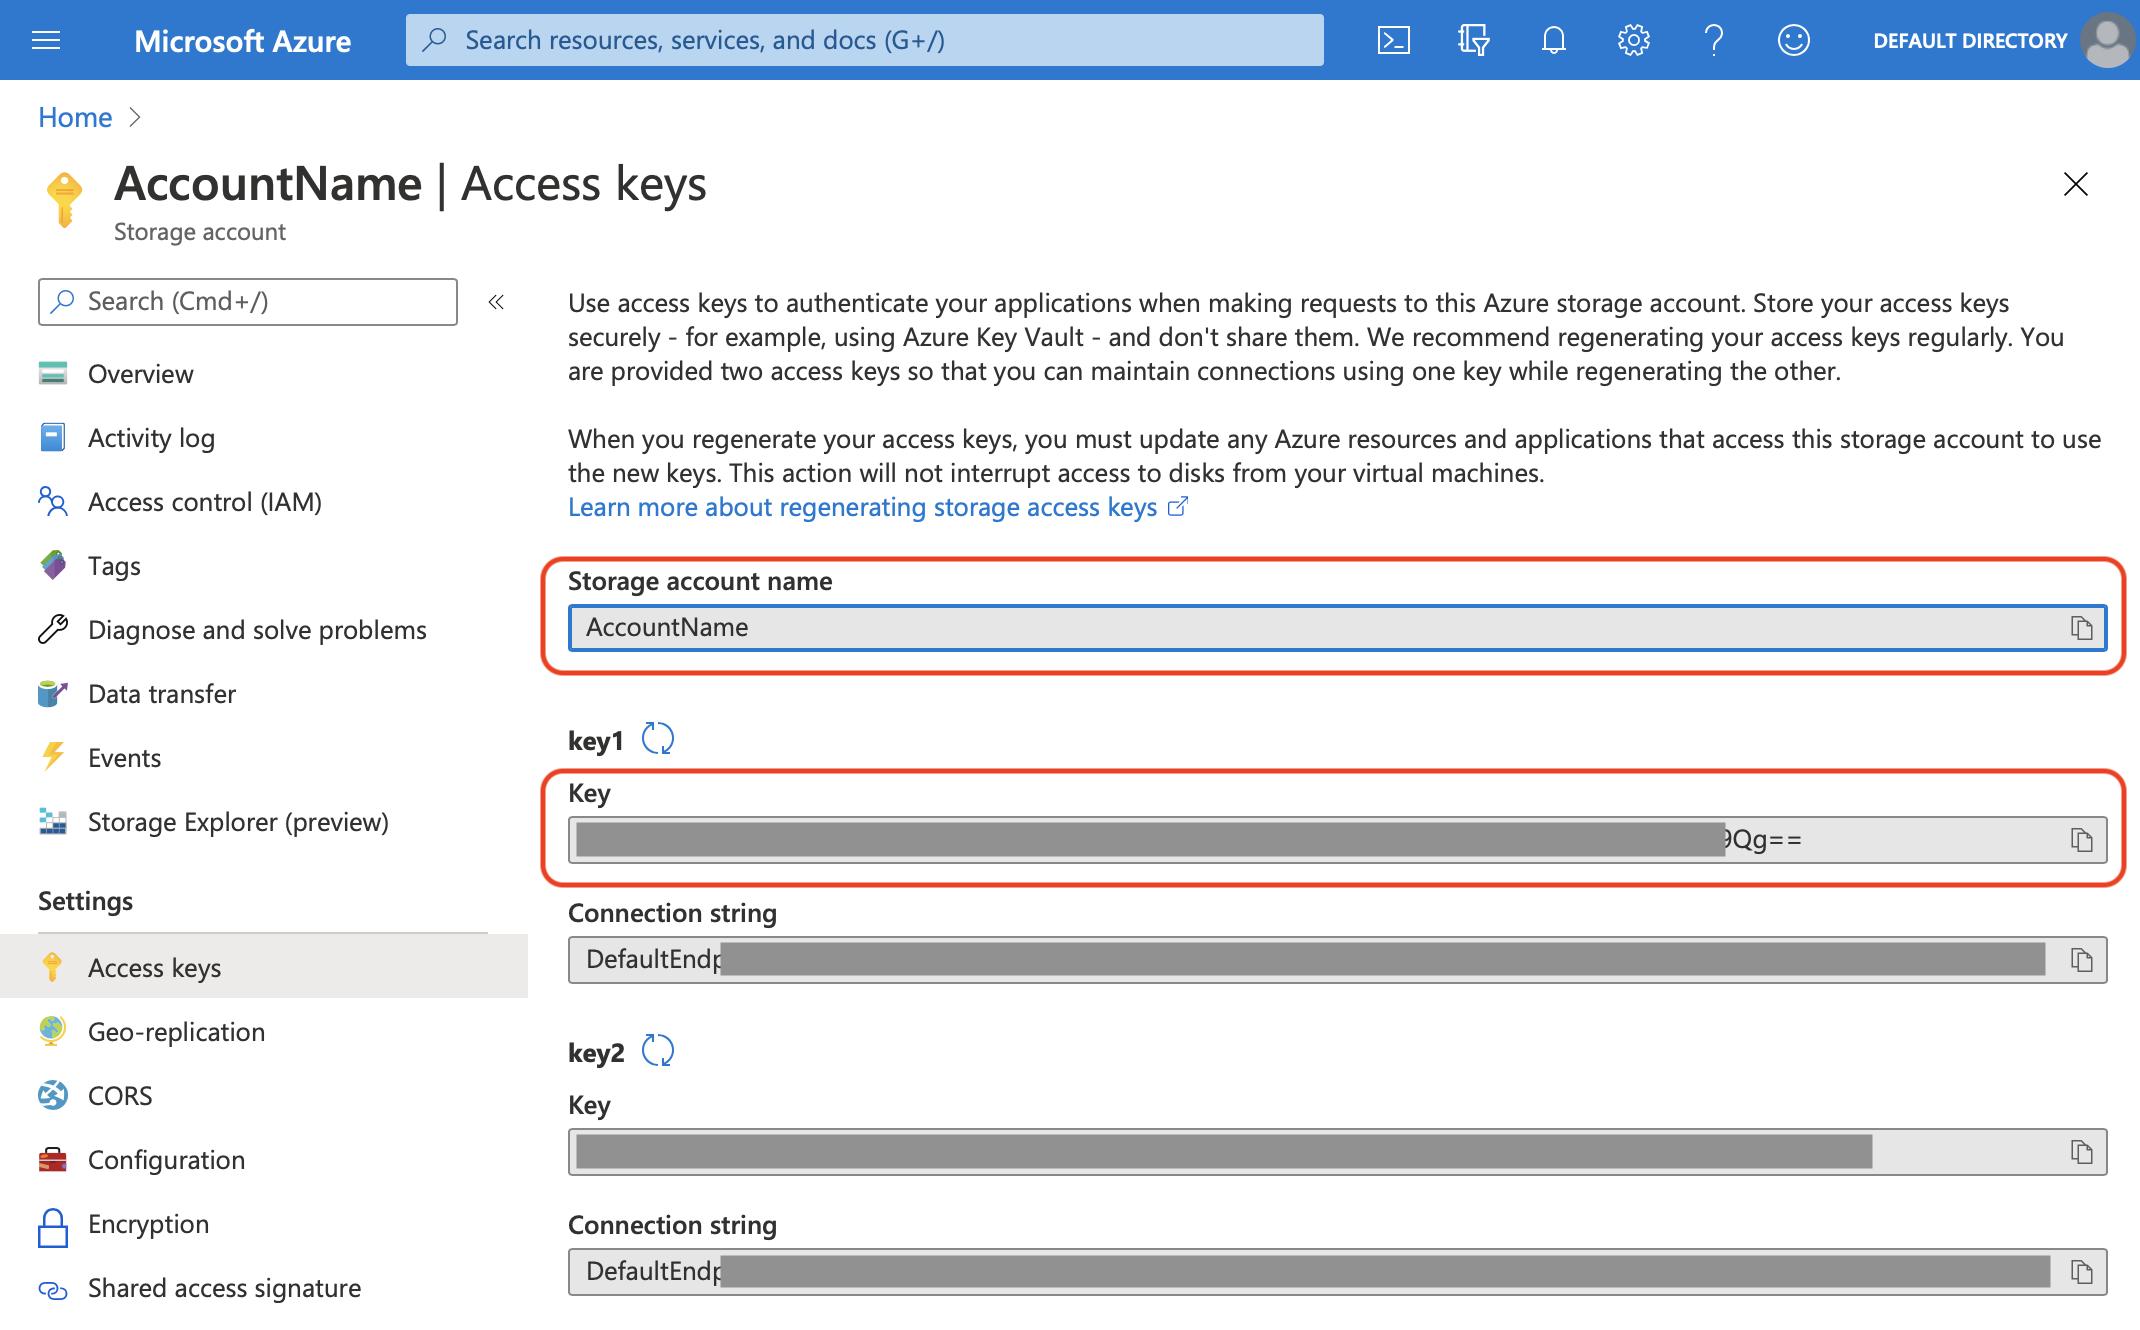 Microsoft Azure Storage Access Keys